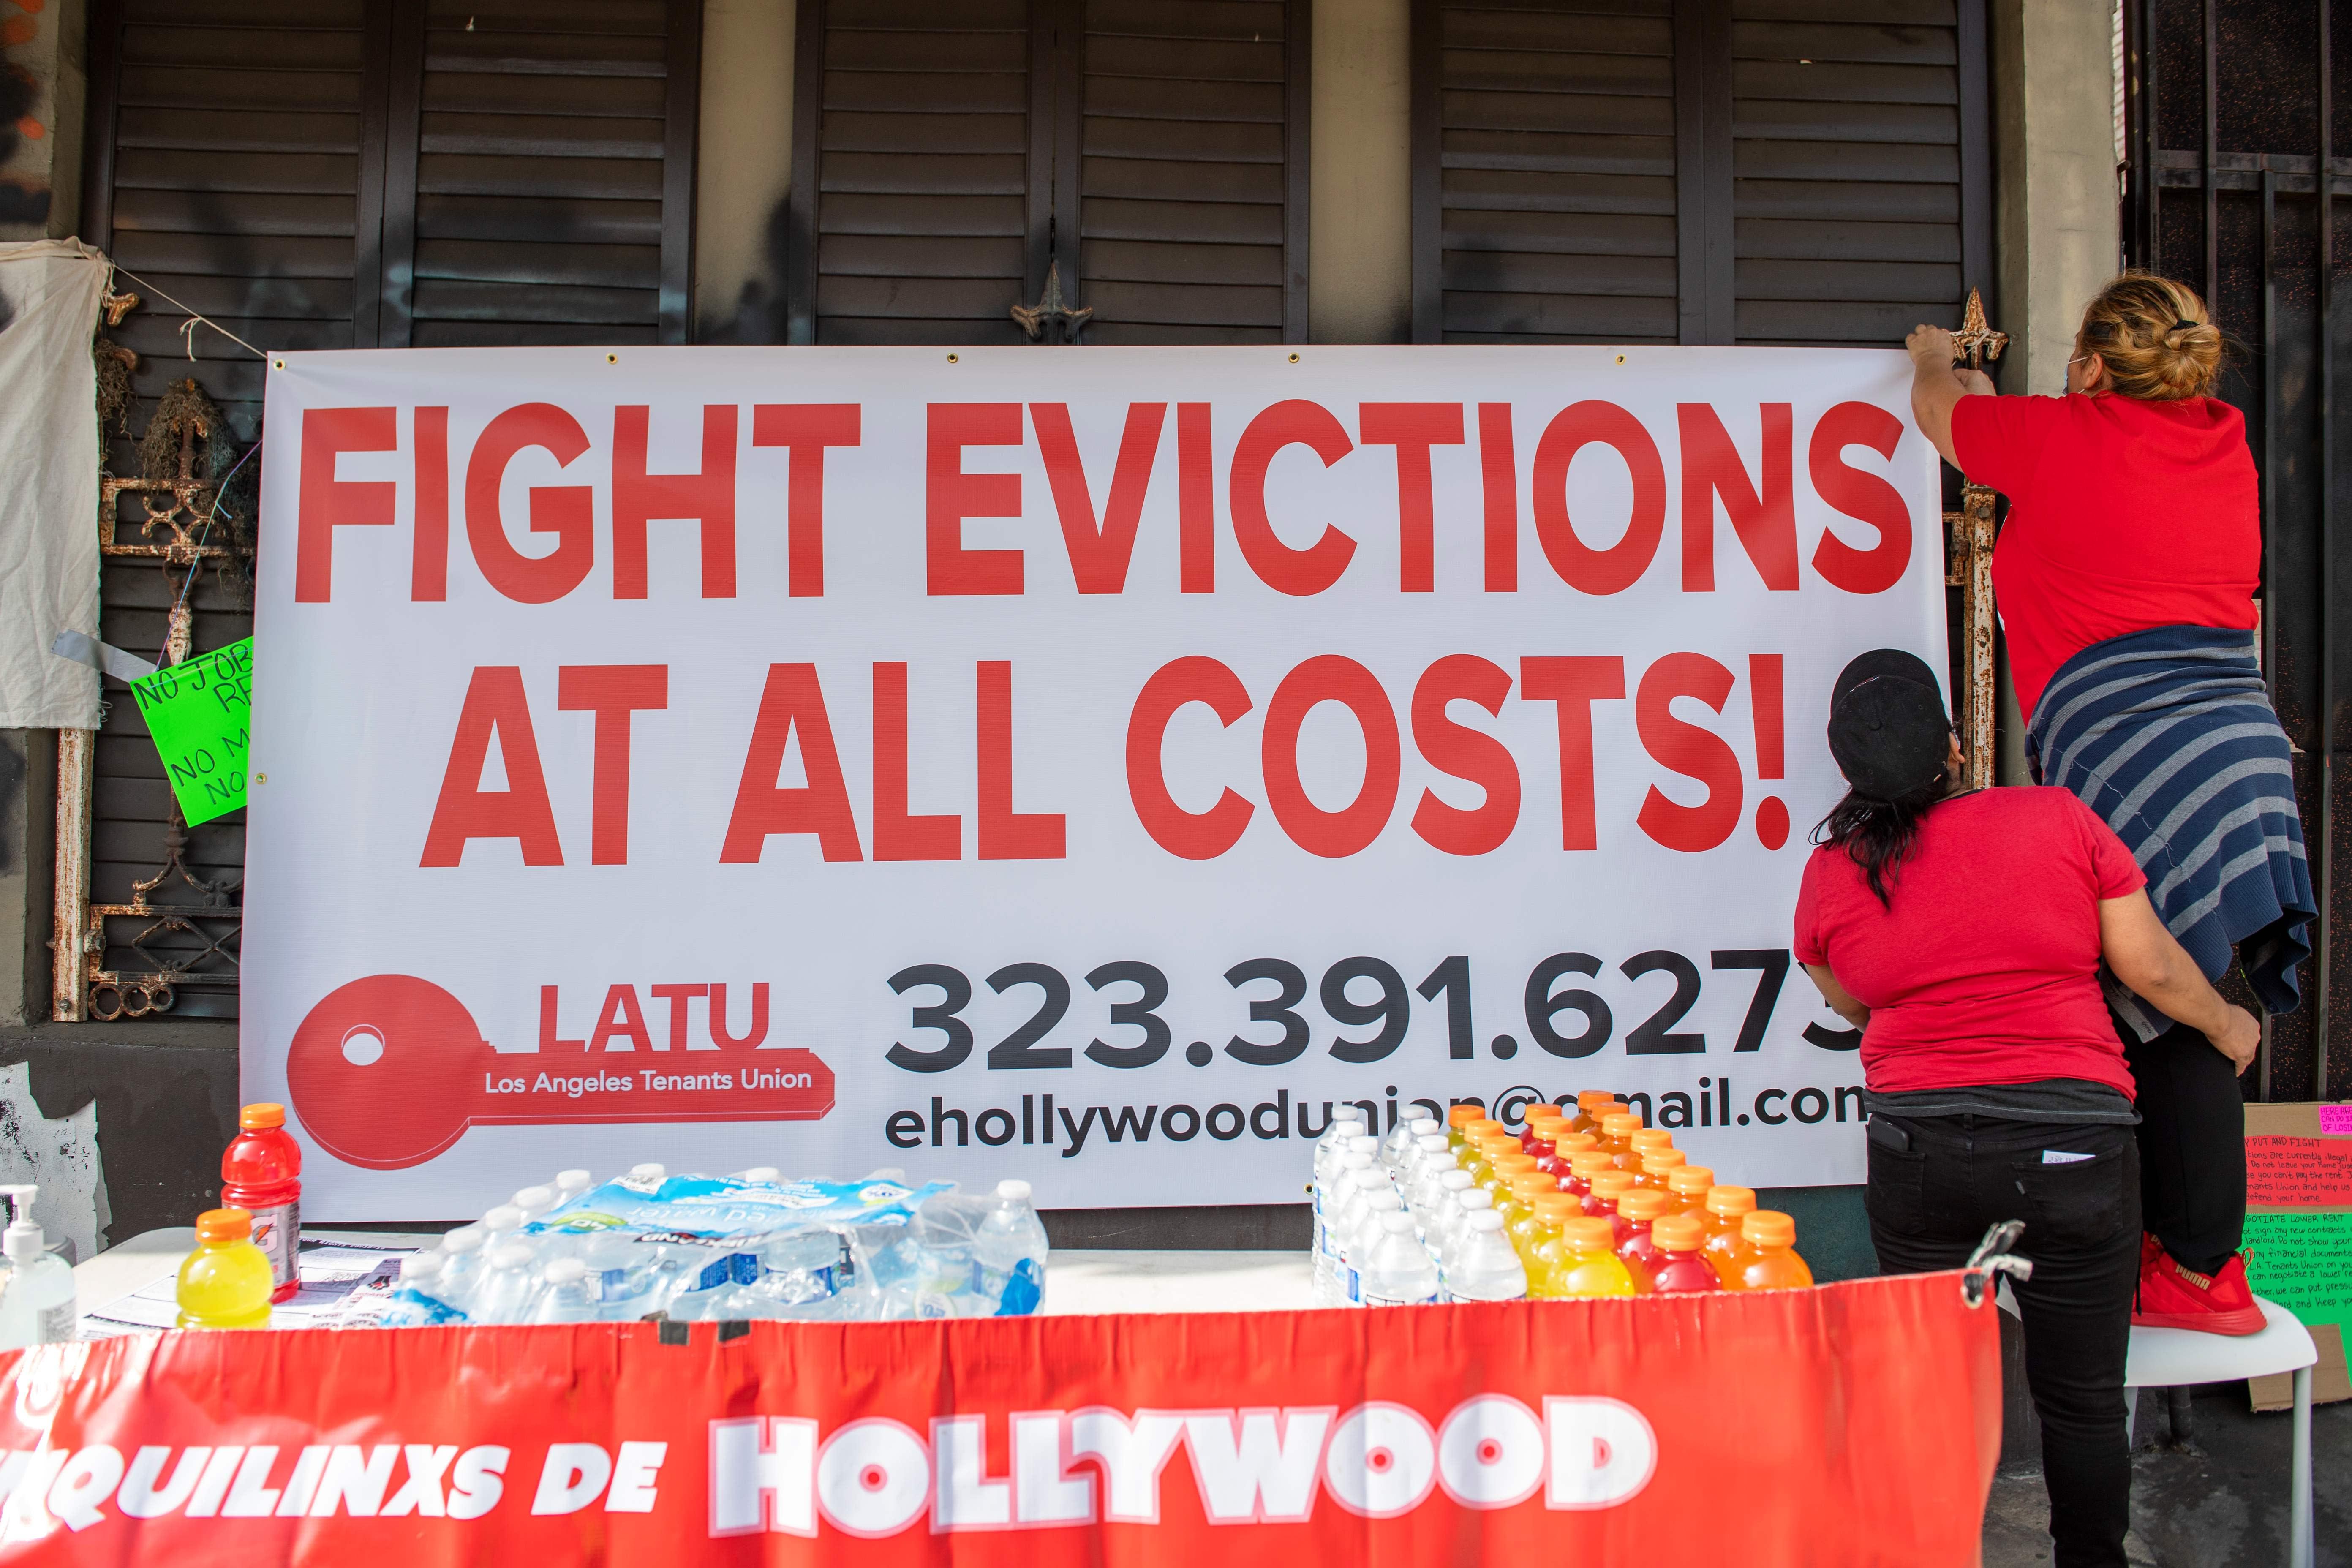 Congress fails to extend eviction moratorium